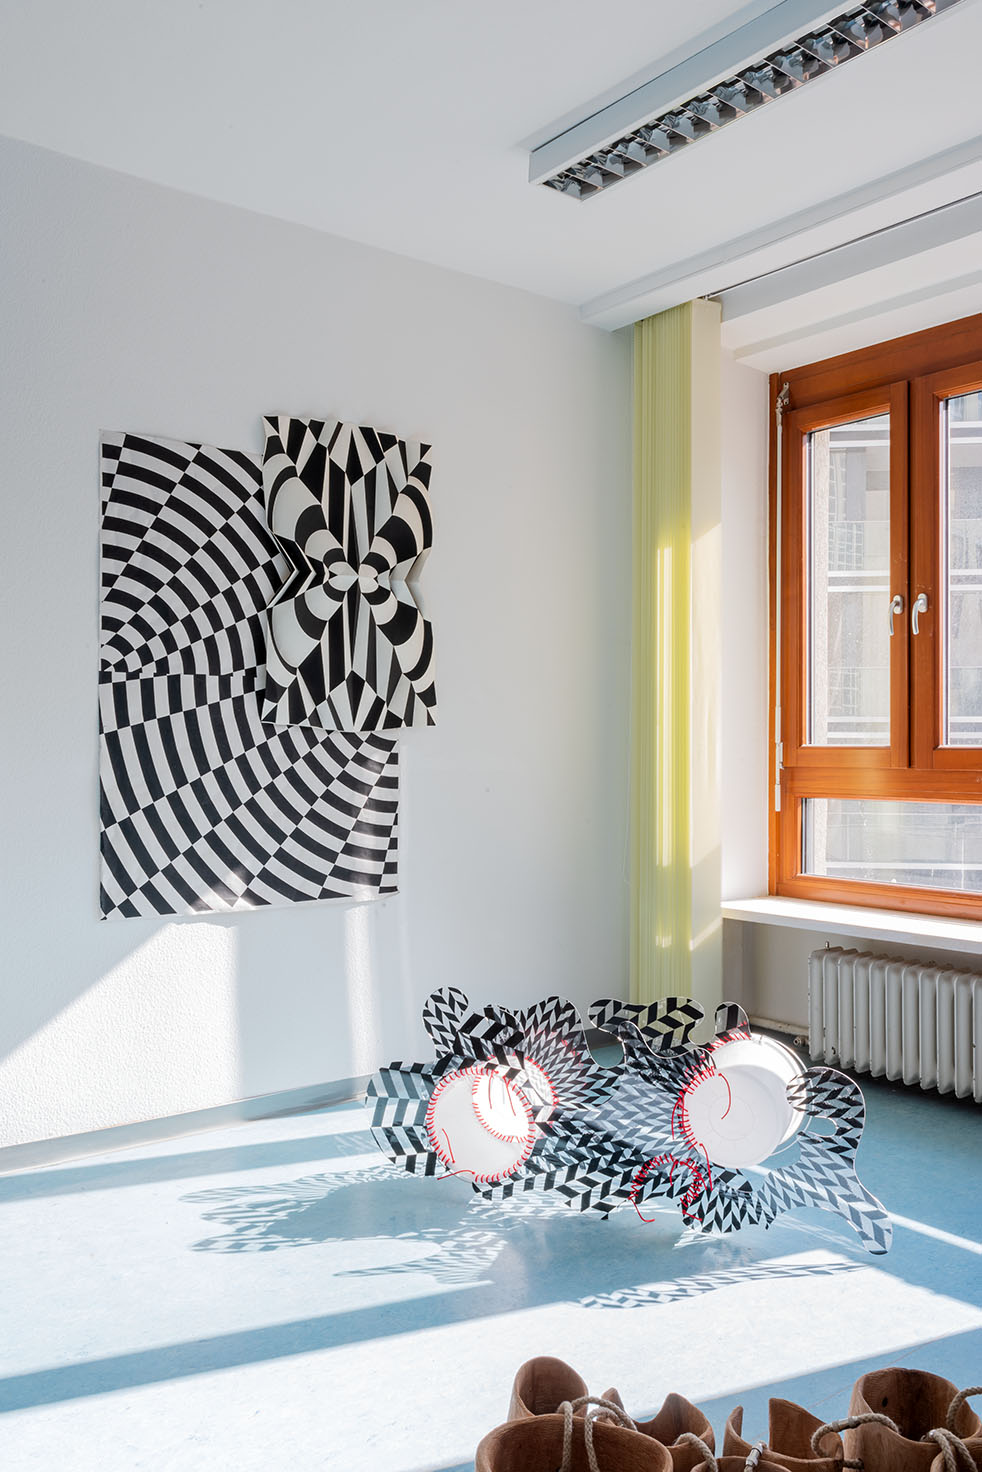 Parallel Vienna KV Baden 2